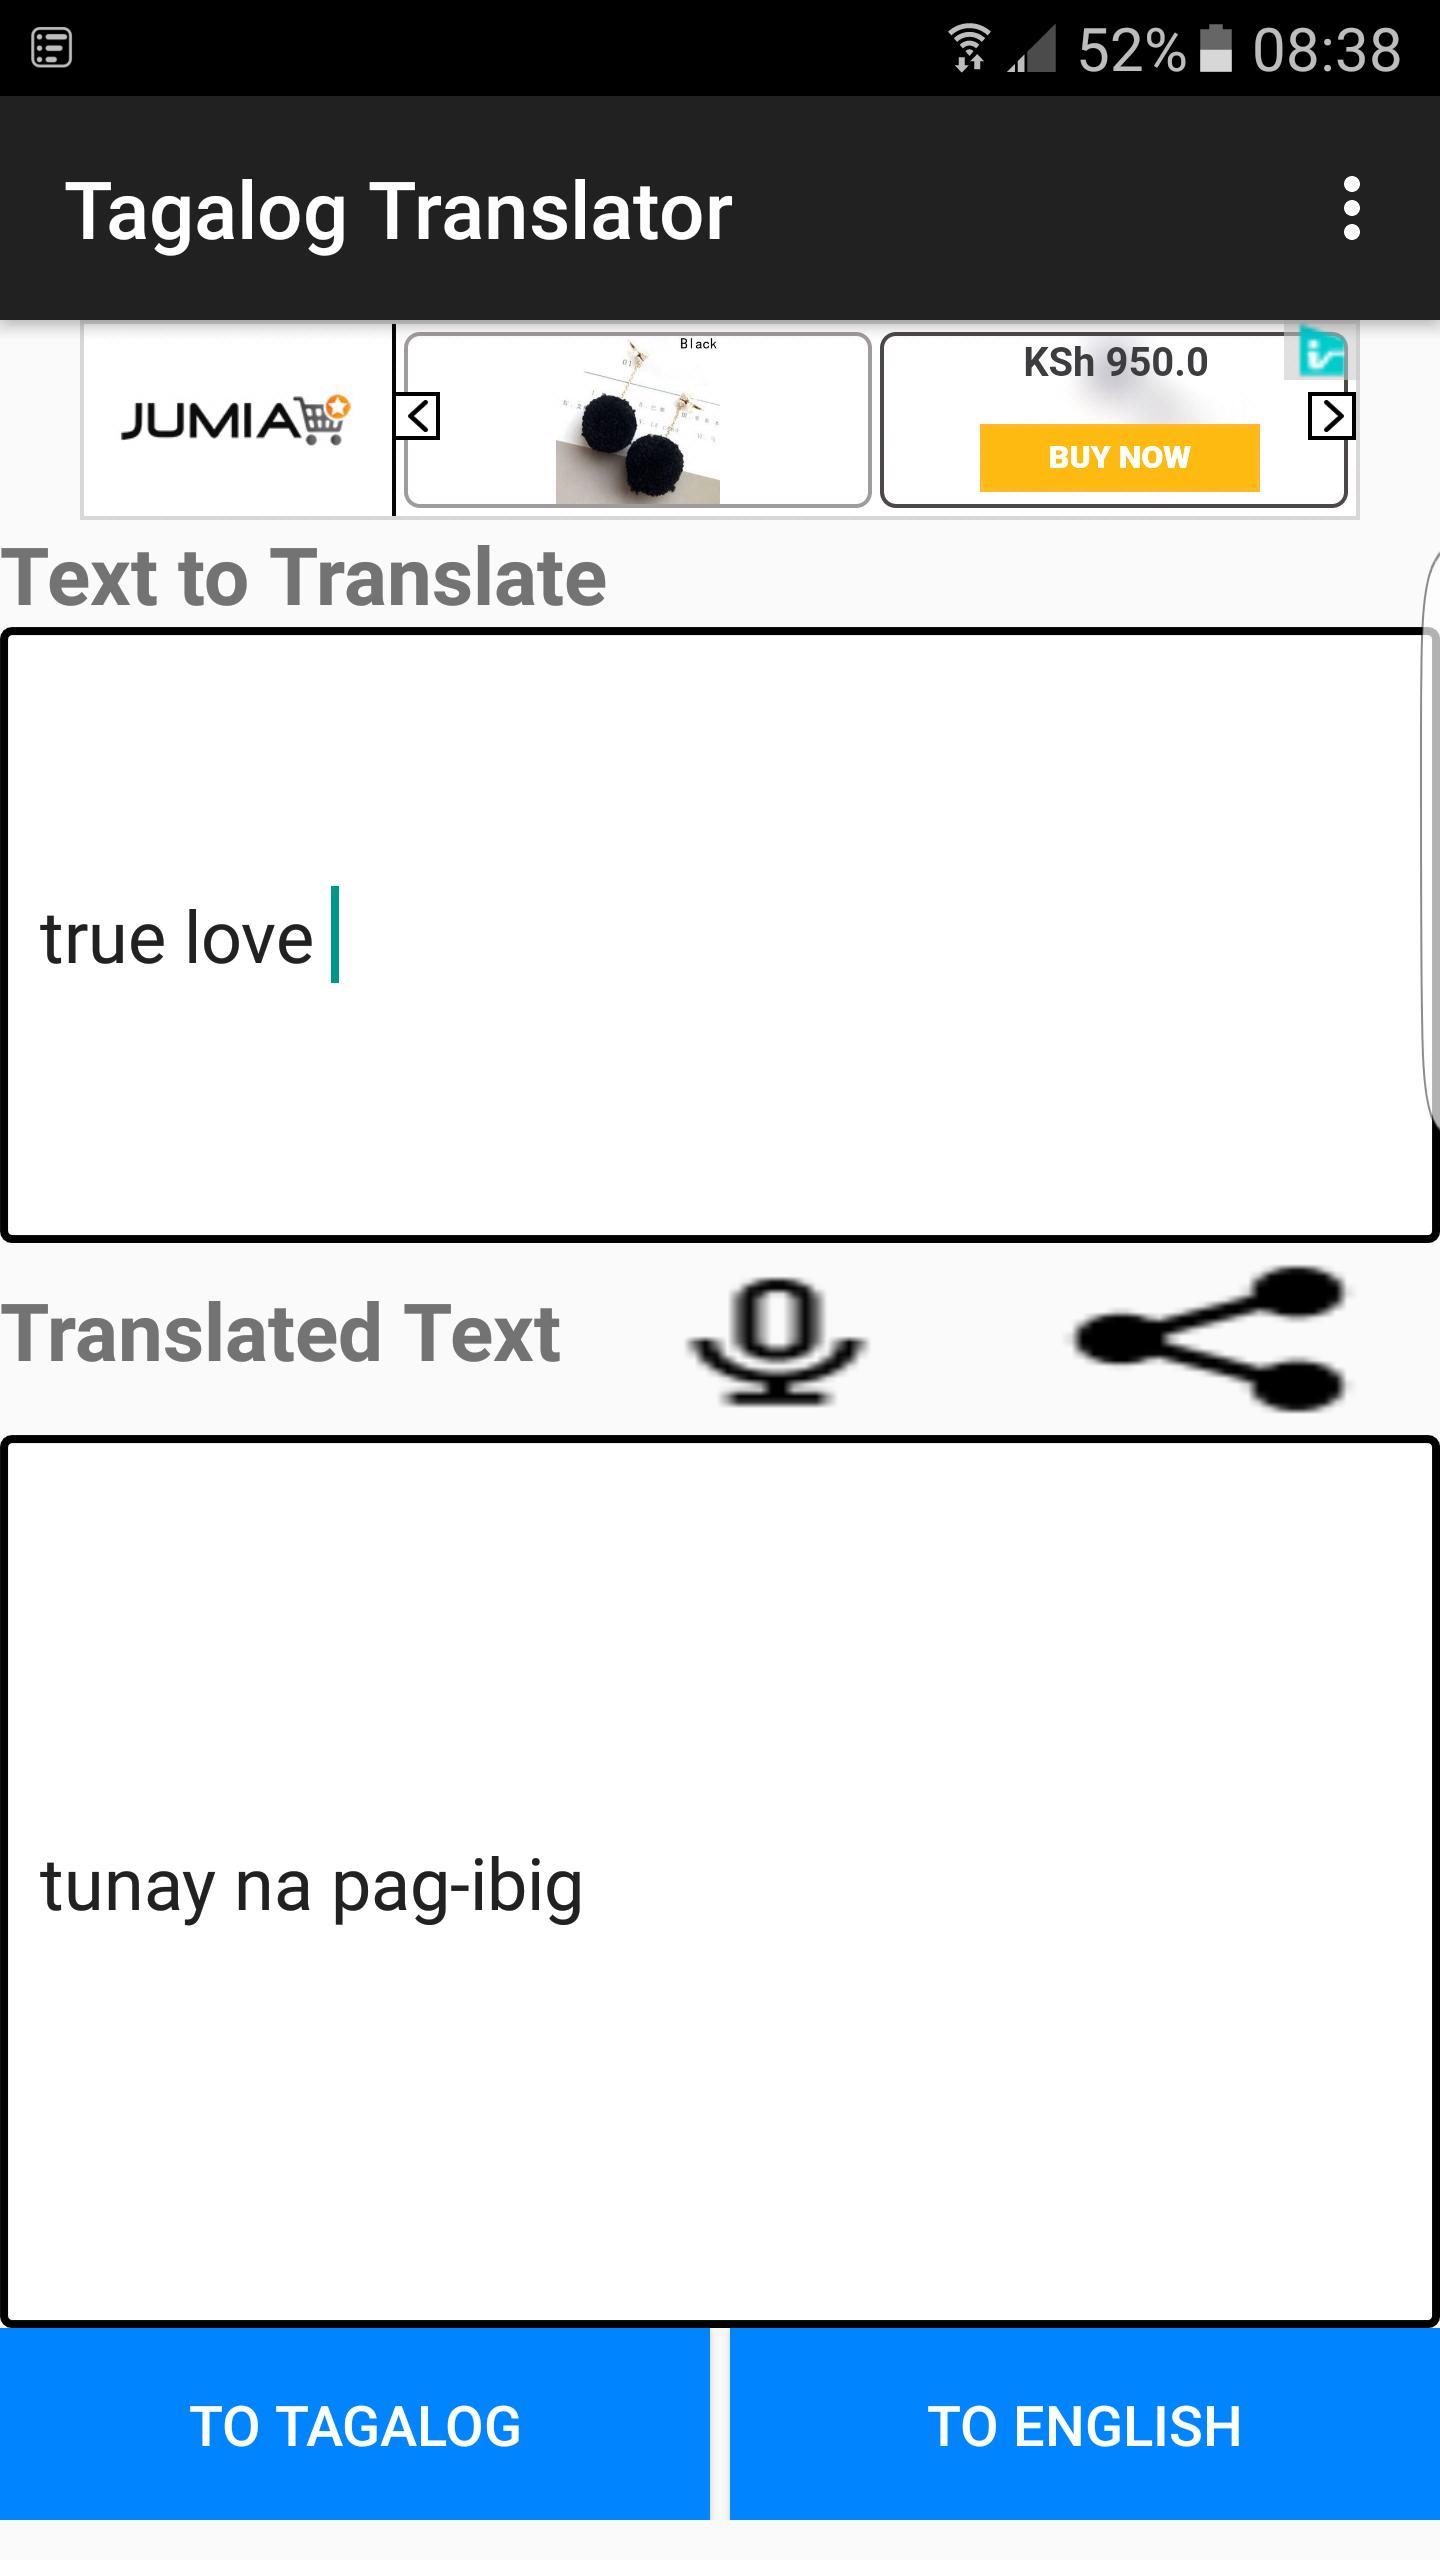 Tagalog English Translator For Android Apk Download